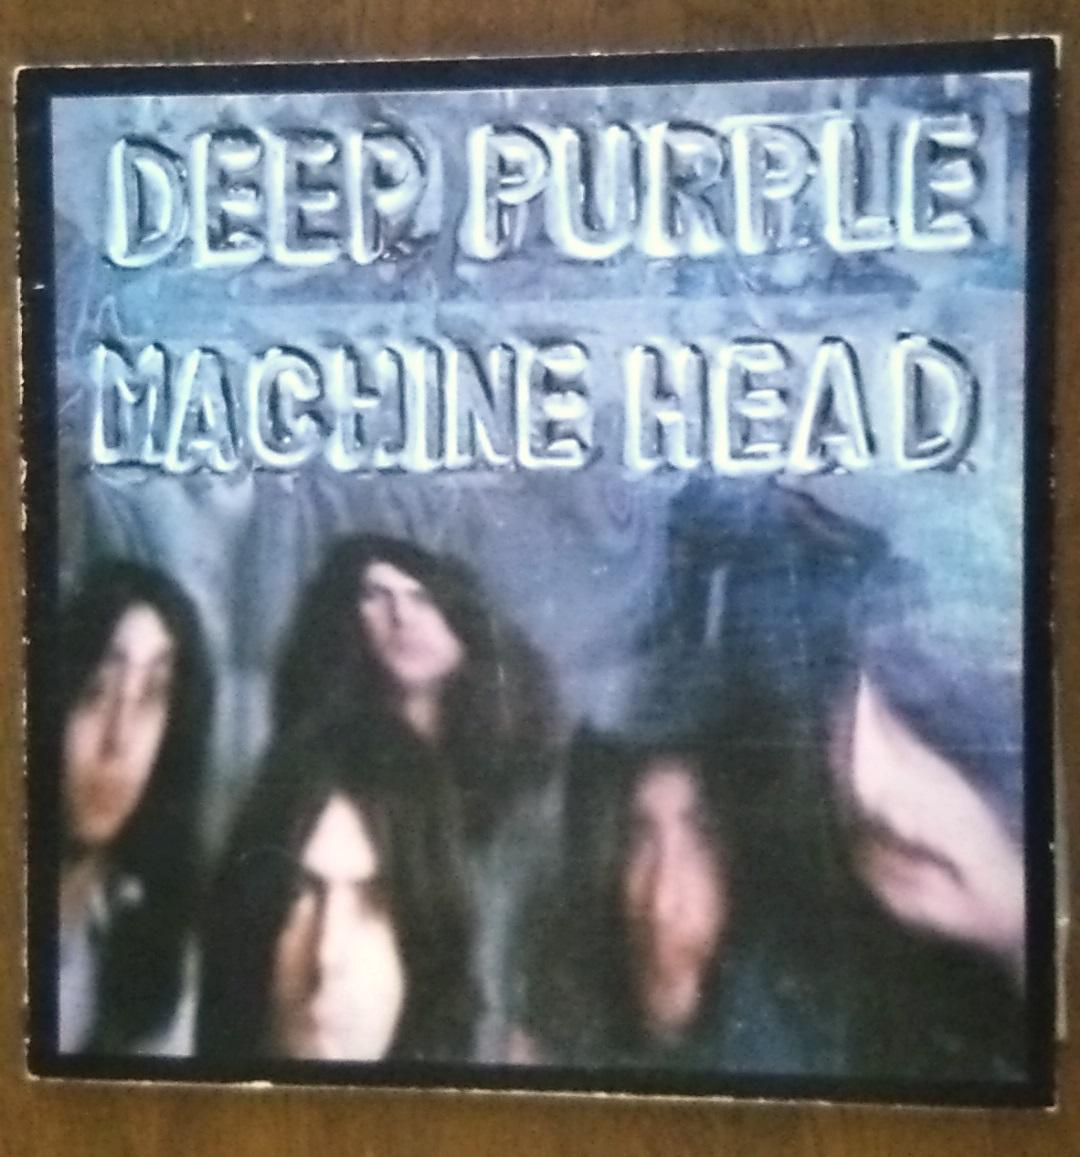 Deep Purple – Machine Head ディープ・パープル - マシーン・ヘッド